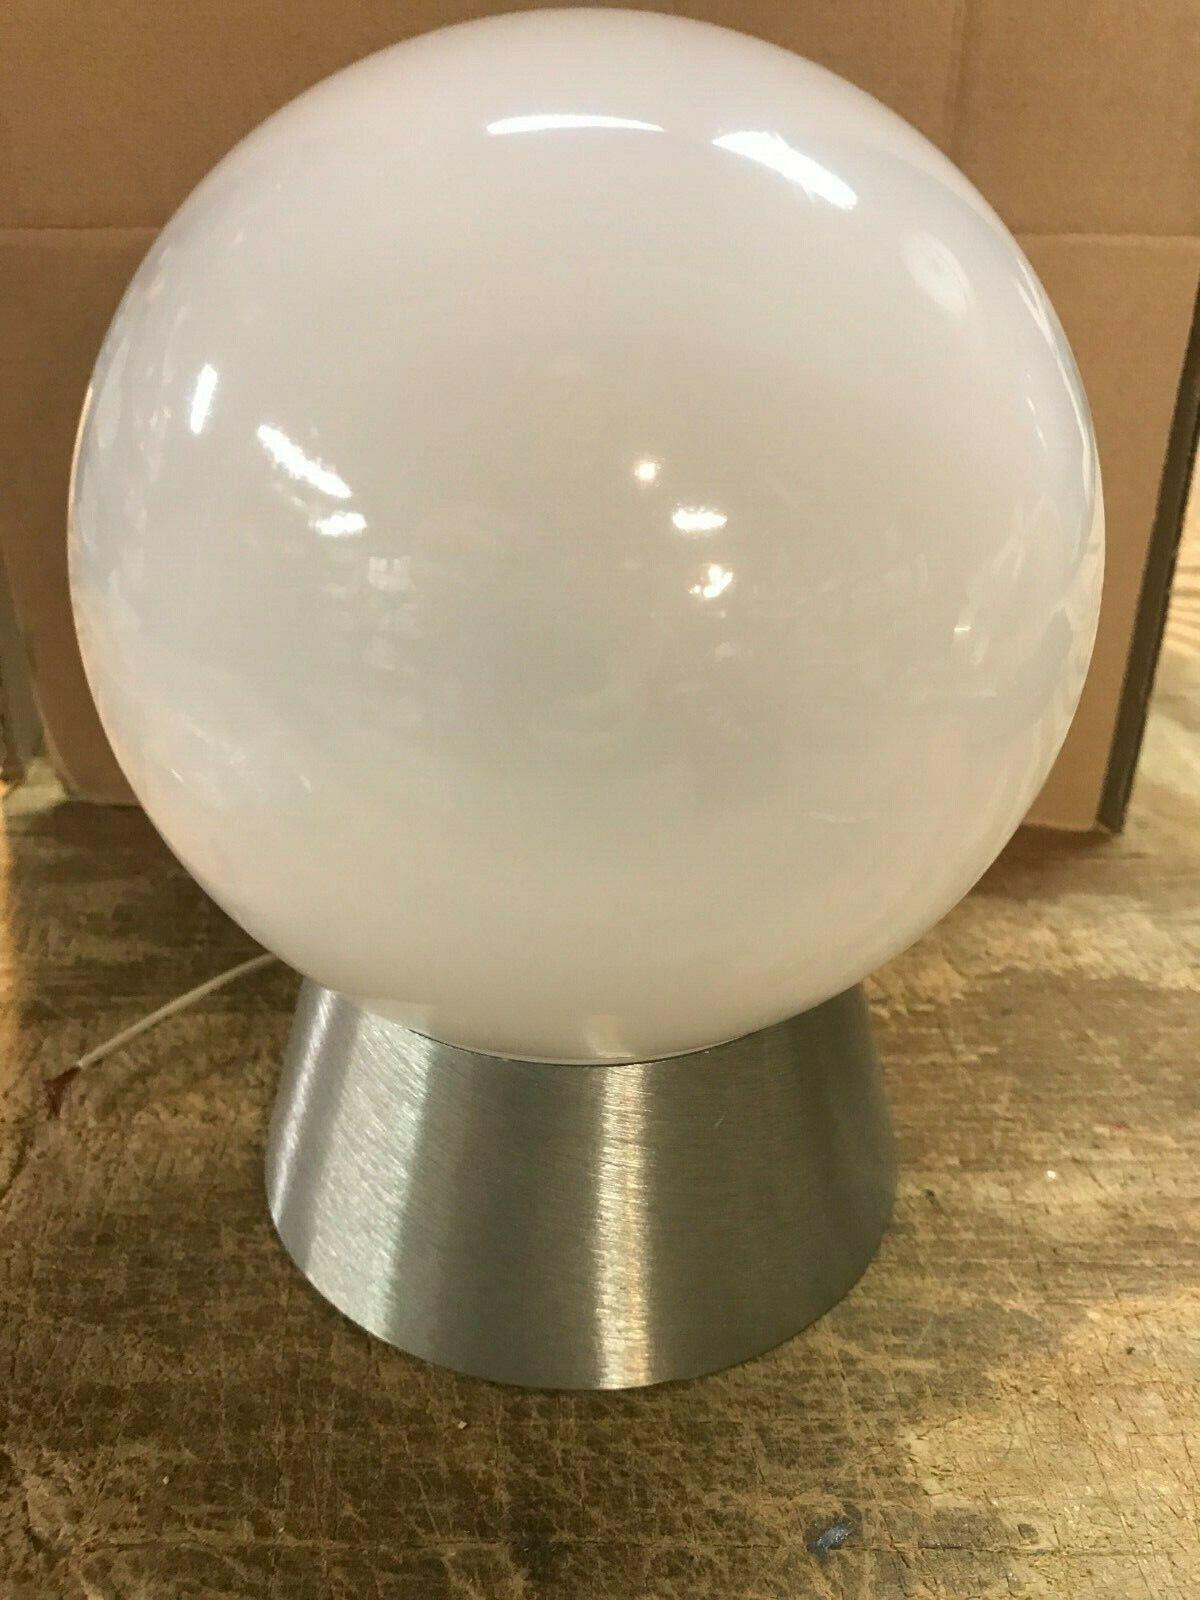 MOBILE HOME OUTSIDE PLASTIC LIGHT FIXTURE PORCH LIGHT GLOBE